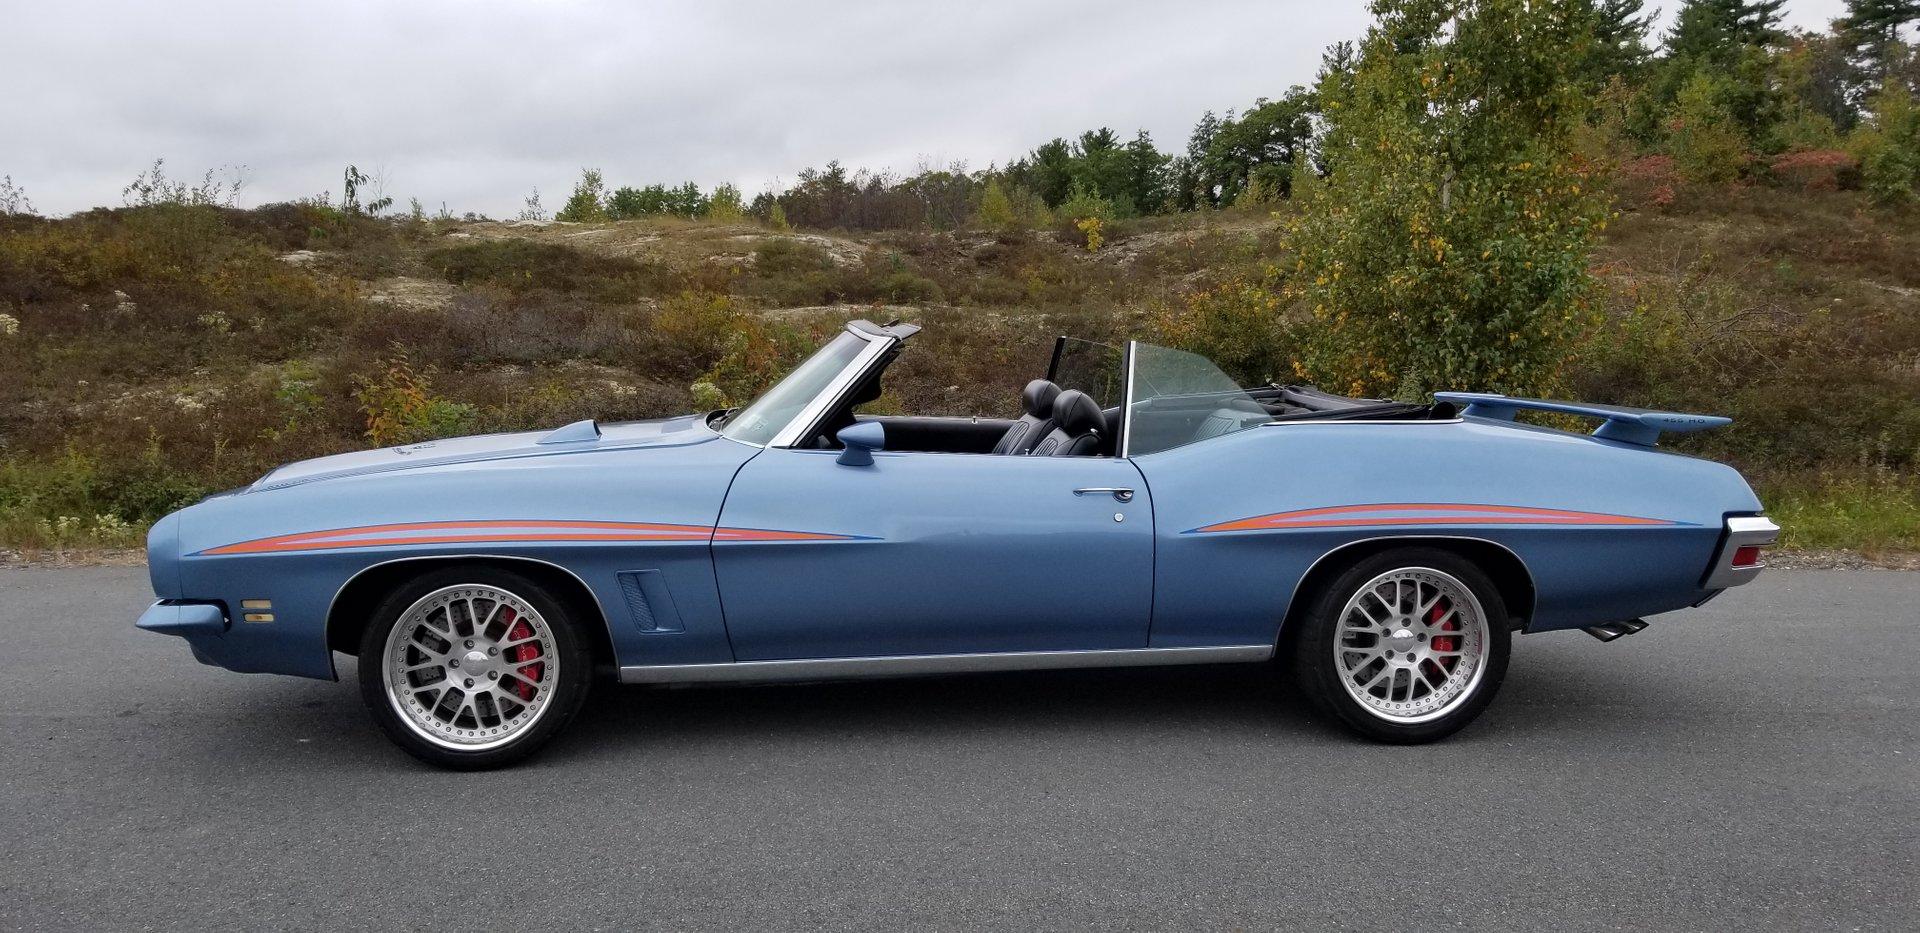 1972 Pontiac Lemans | GAA Classic Cars